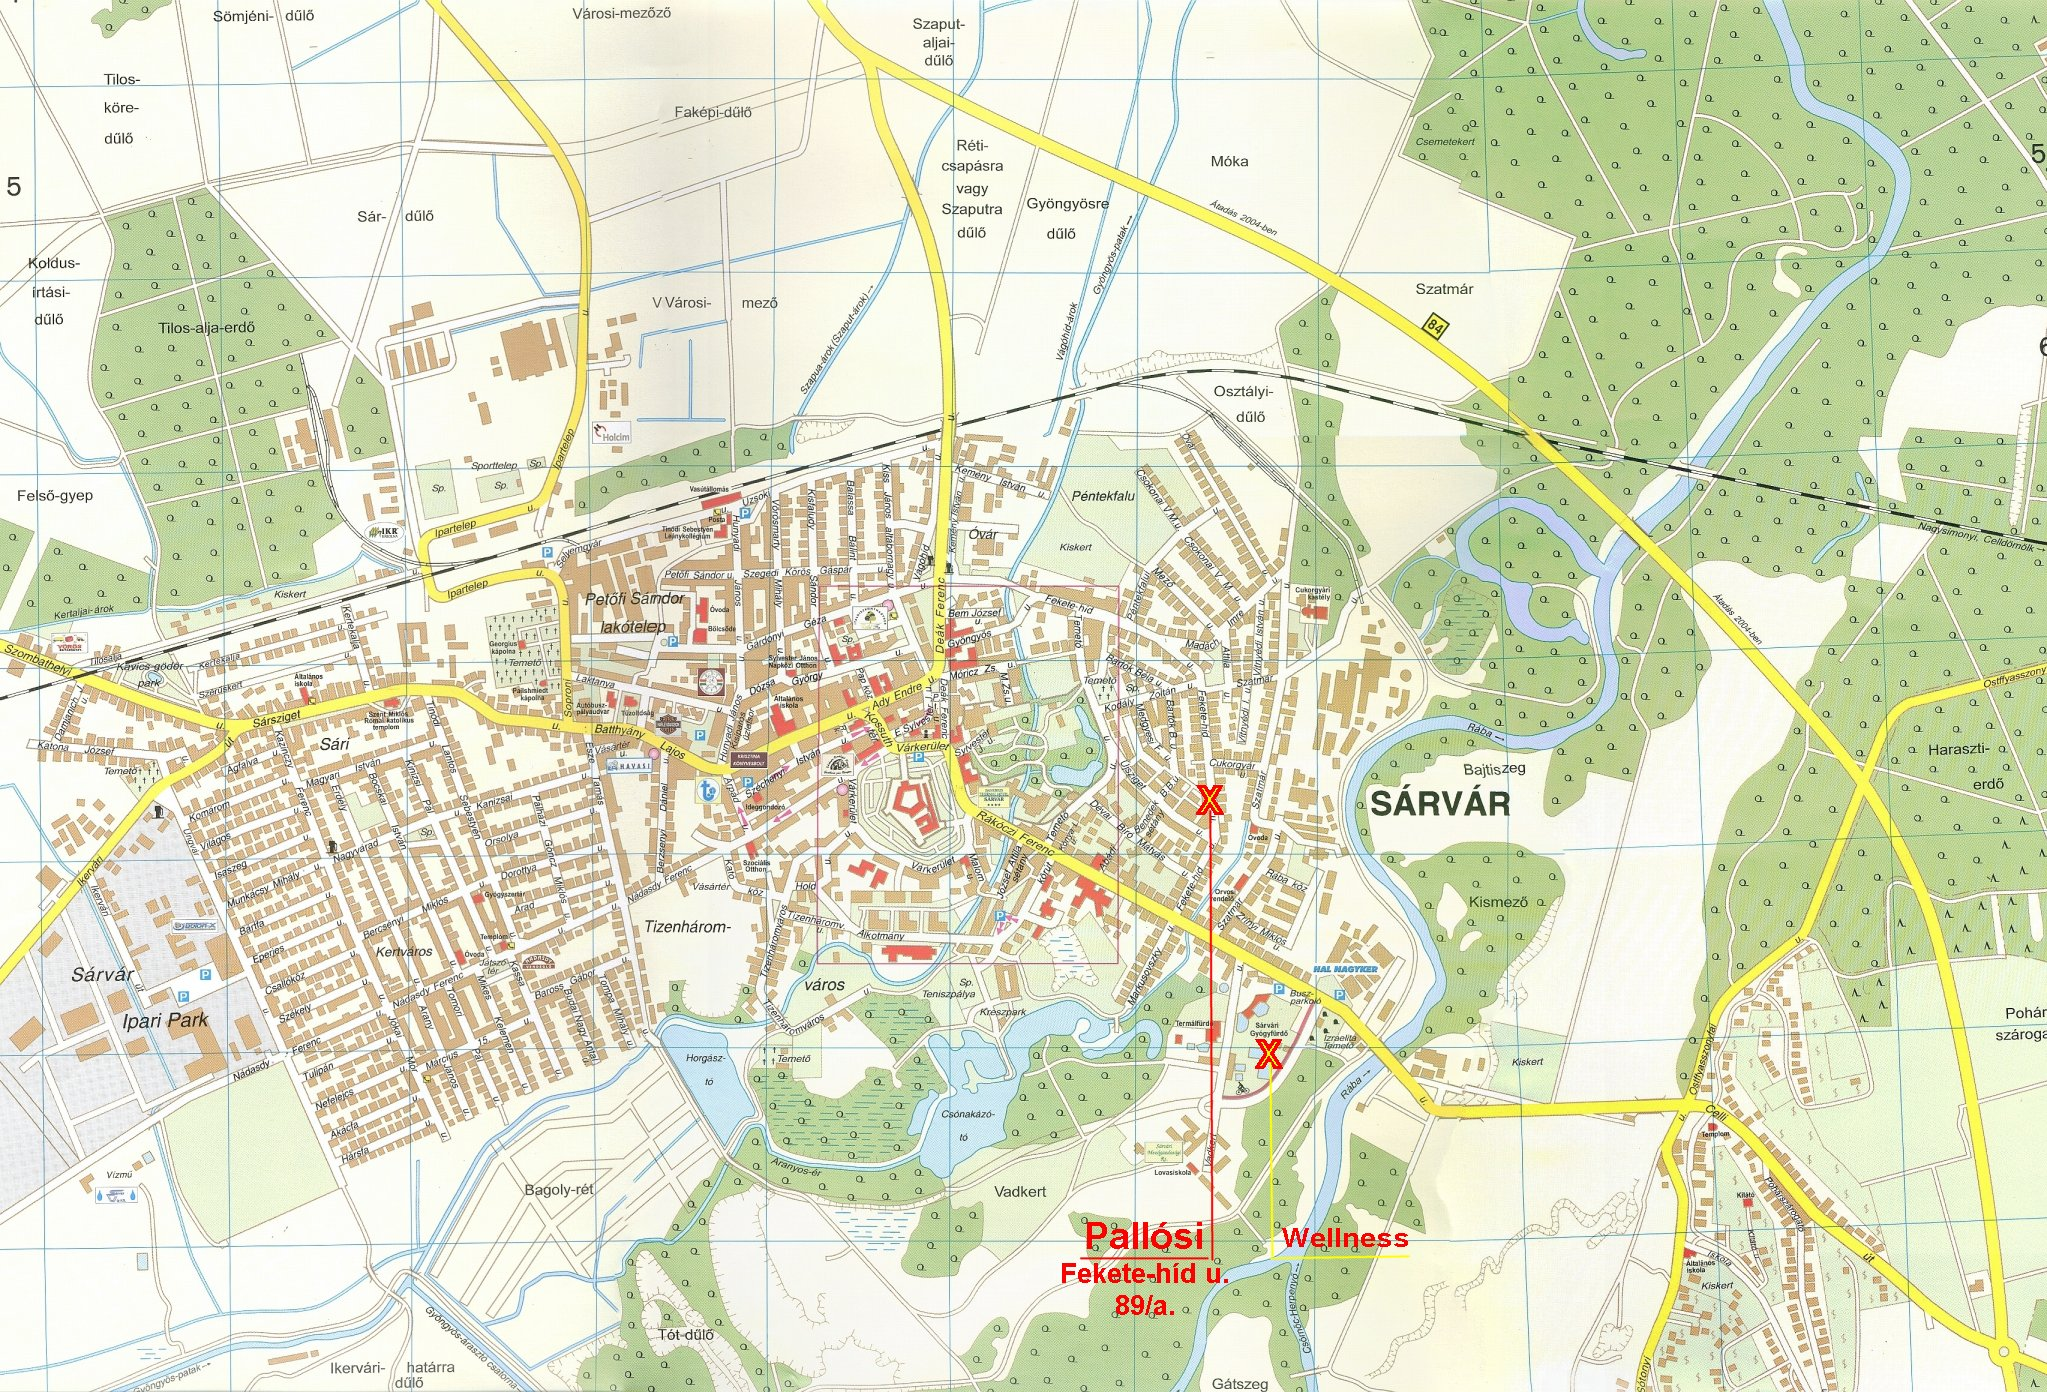 sárvár fürdő térkép Pallósi Ház   Sárvár, Haus Pallósi   Sarvar ::..